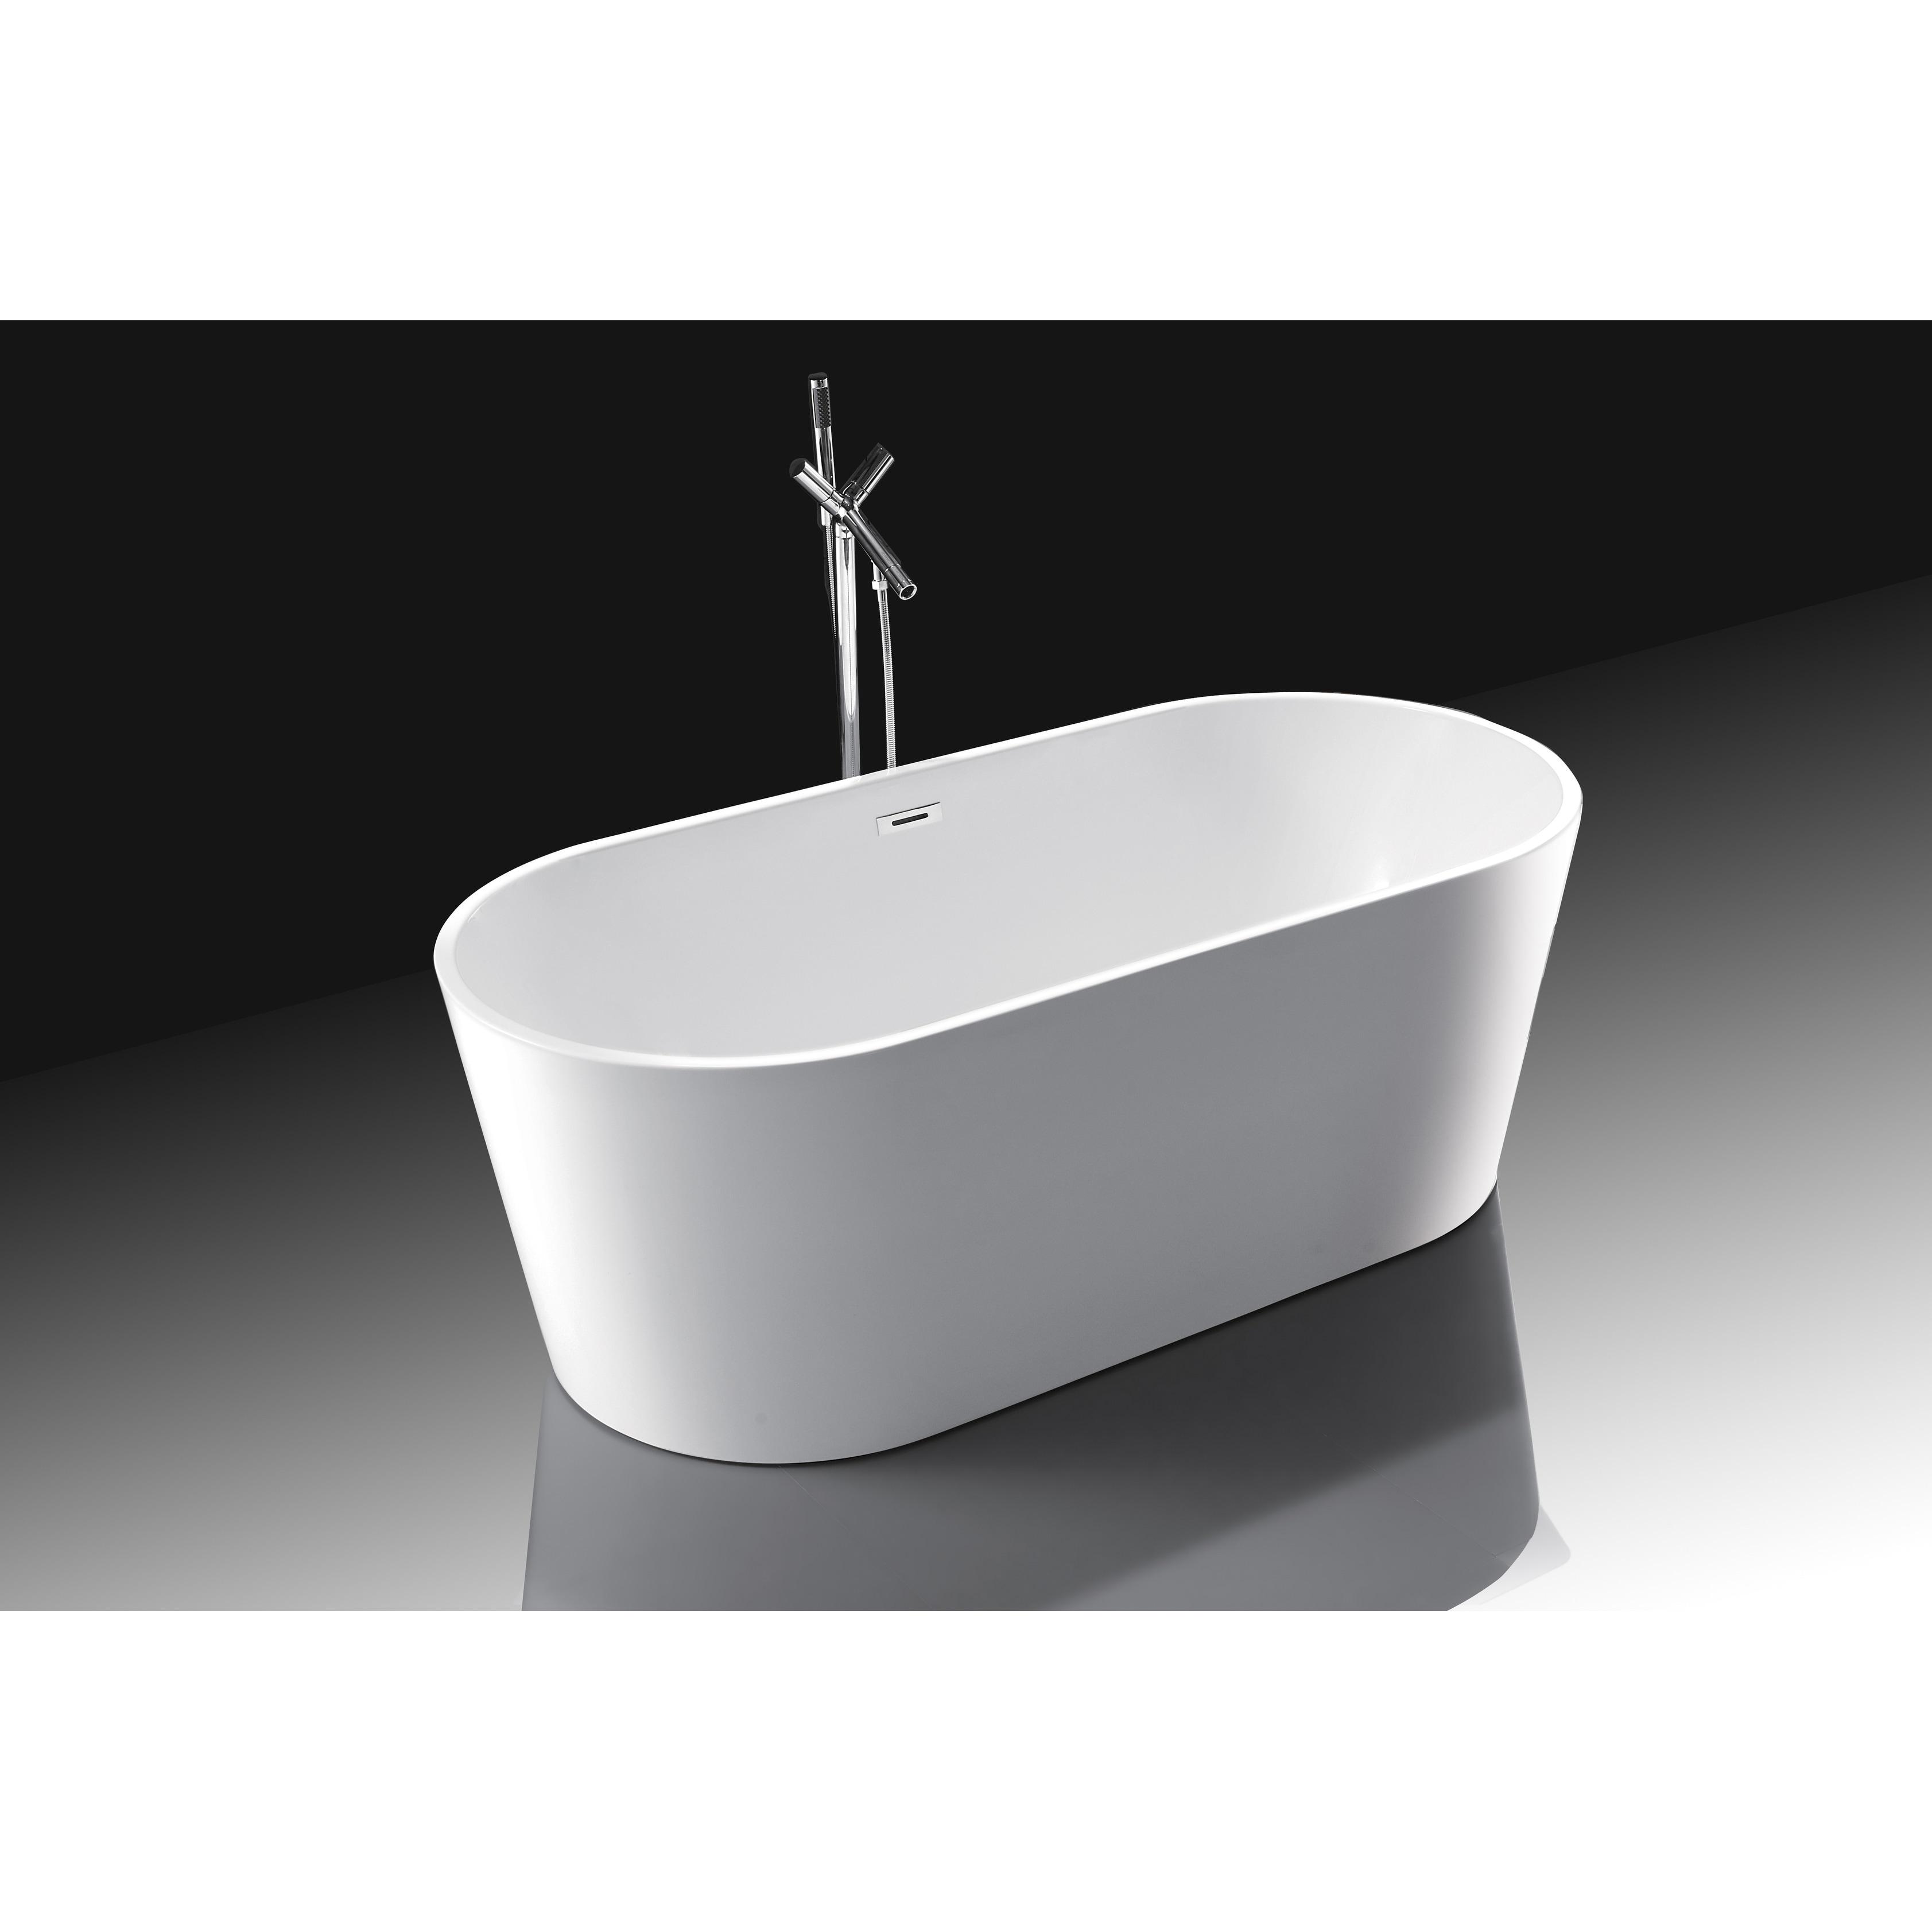 freestanding overstock bathtub oval product wyndham bathtubs garden shipping aarhus home free today